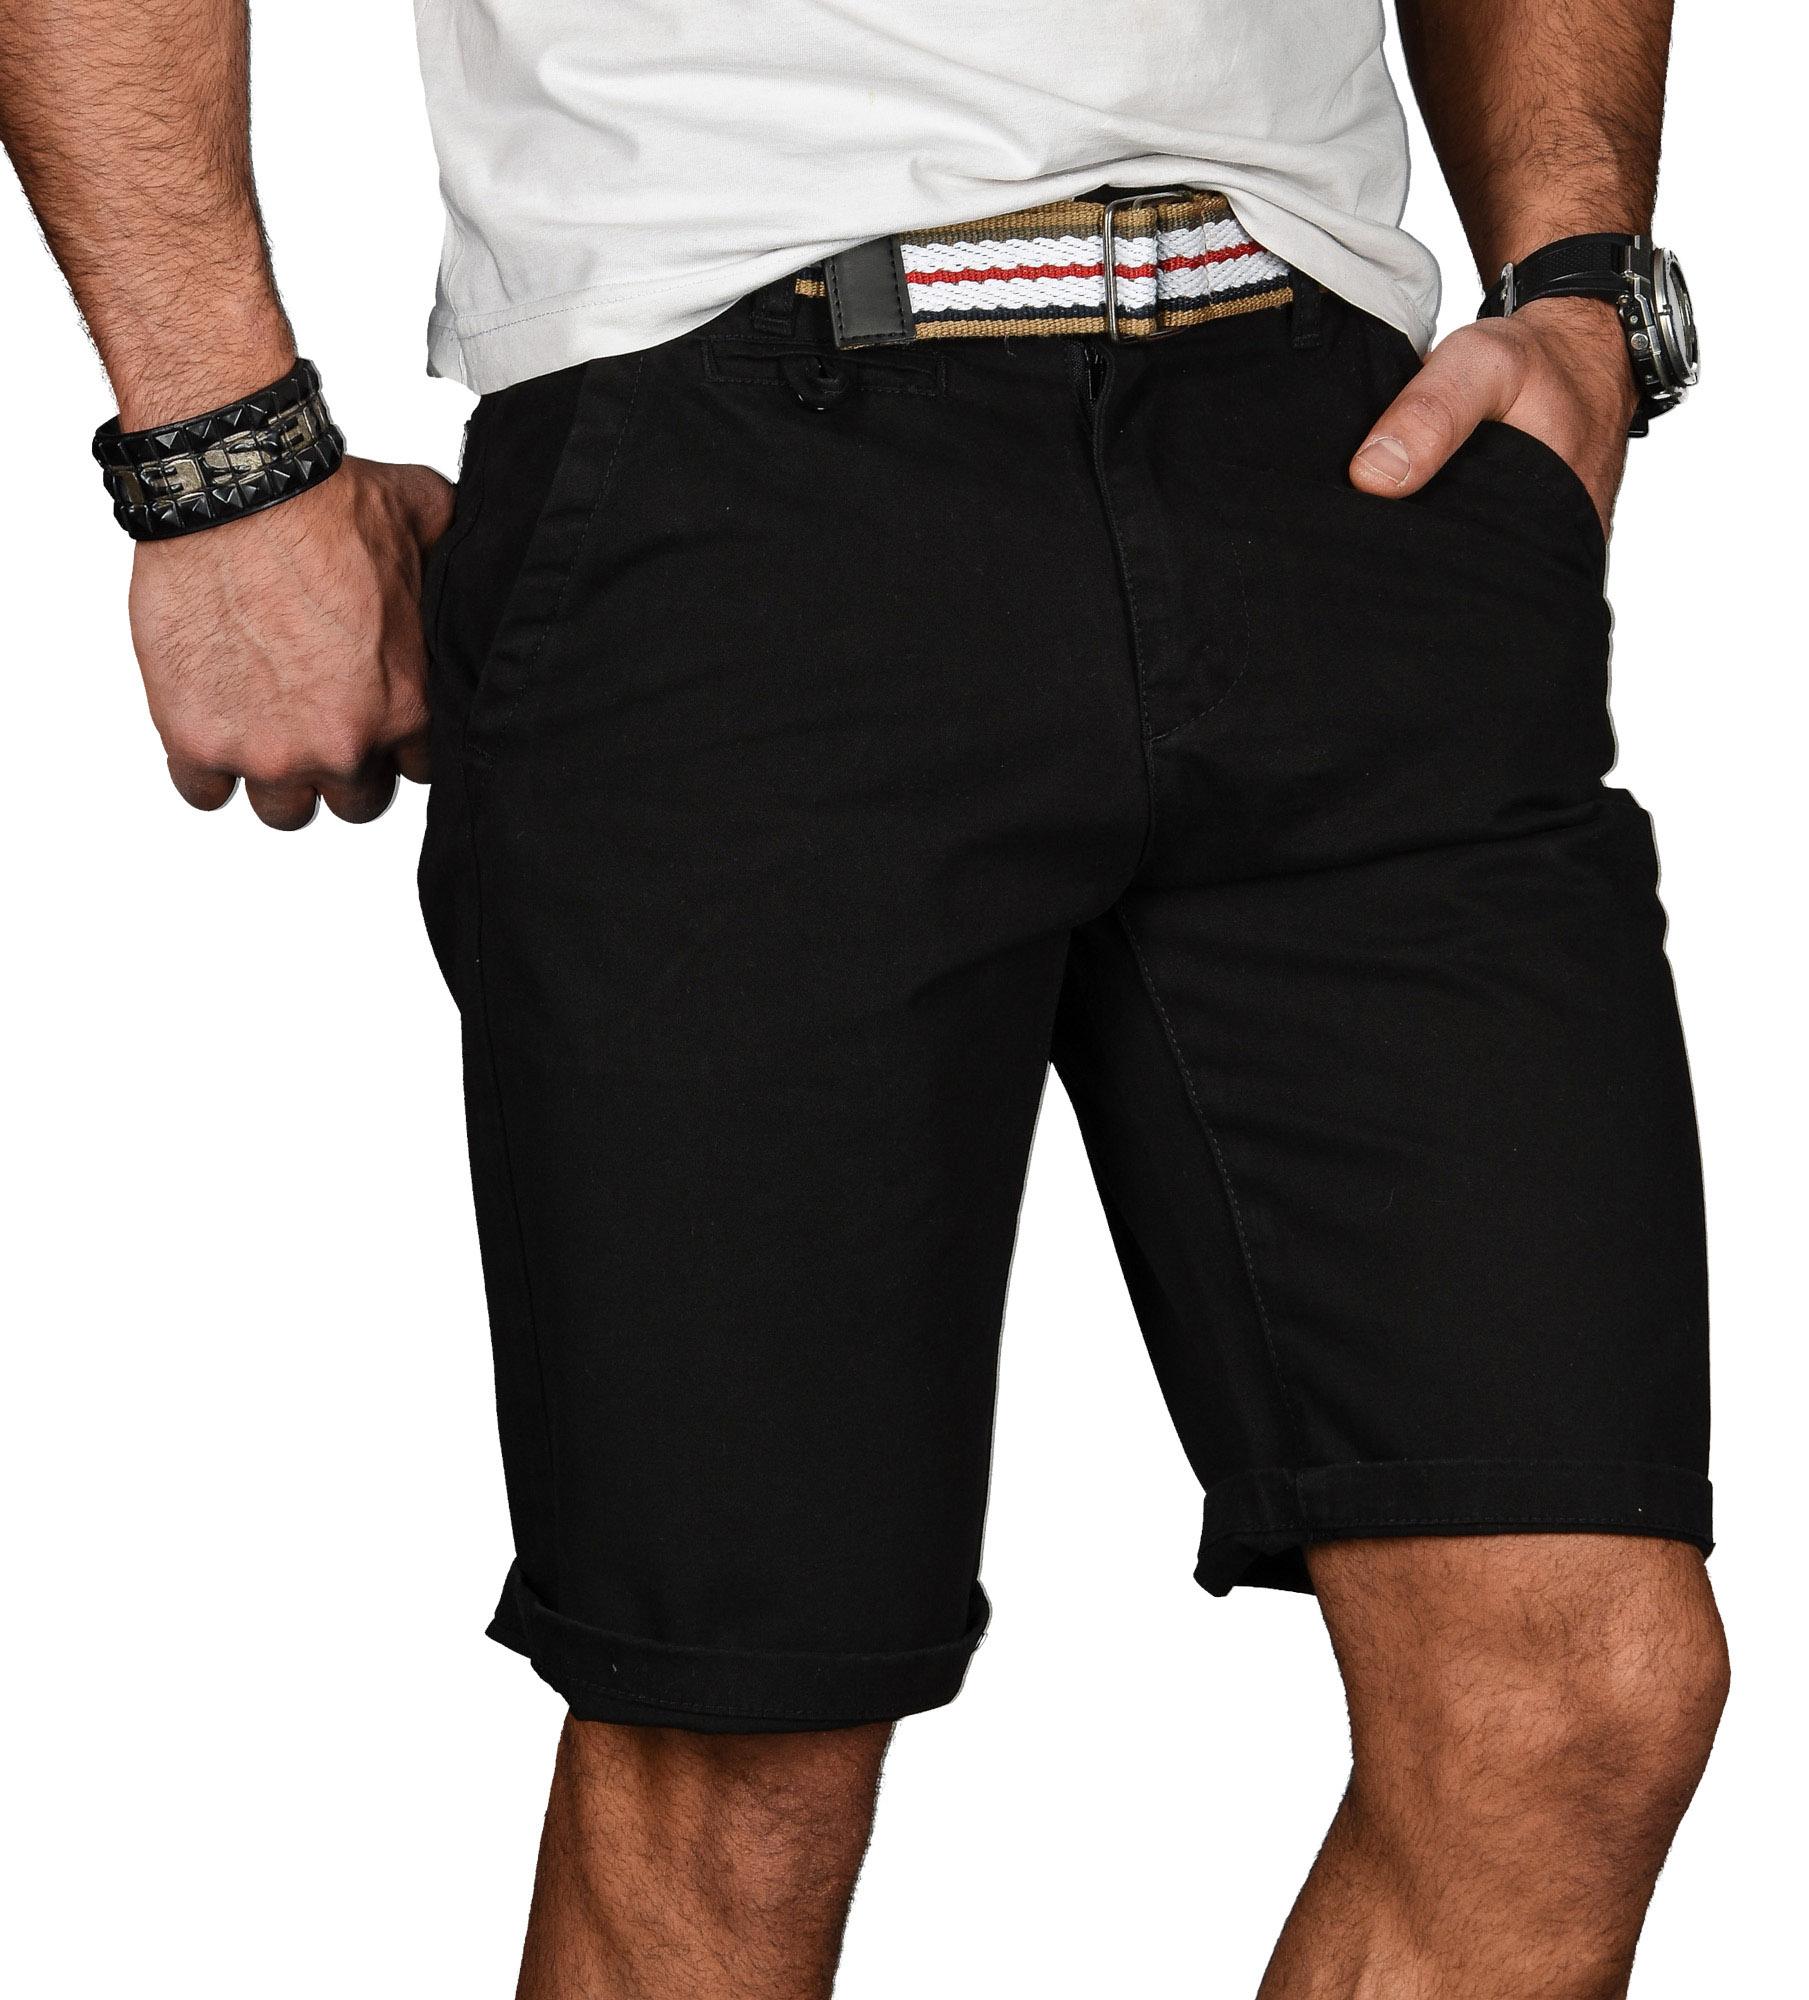 A-Salvarini-Herren-Shorts-kurze-Sommer-Hose-mit-Guertel-Short-Bermuda-NEU-AS096 Indexbild 7